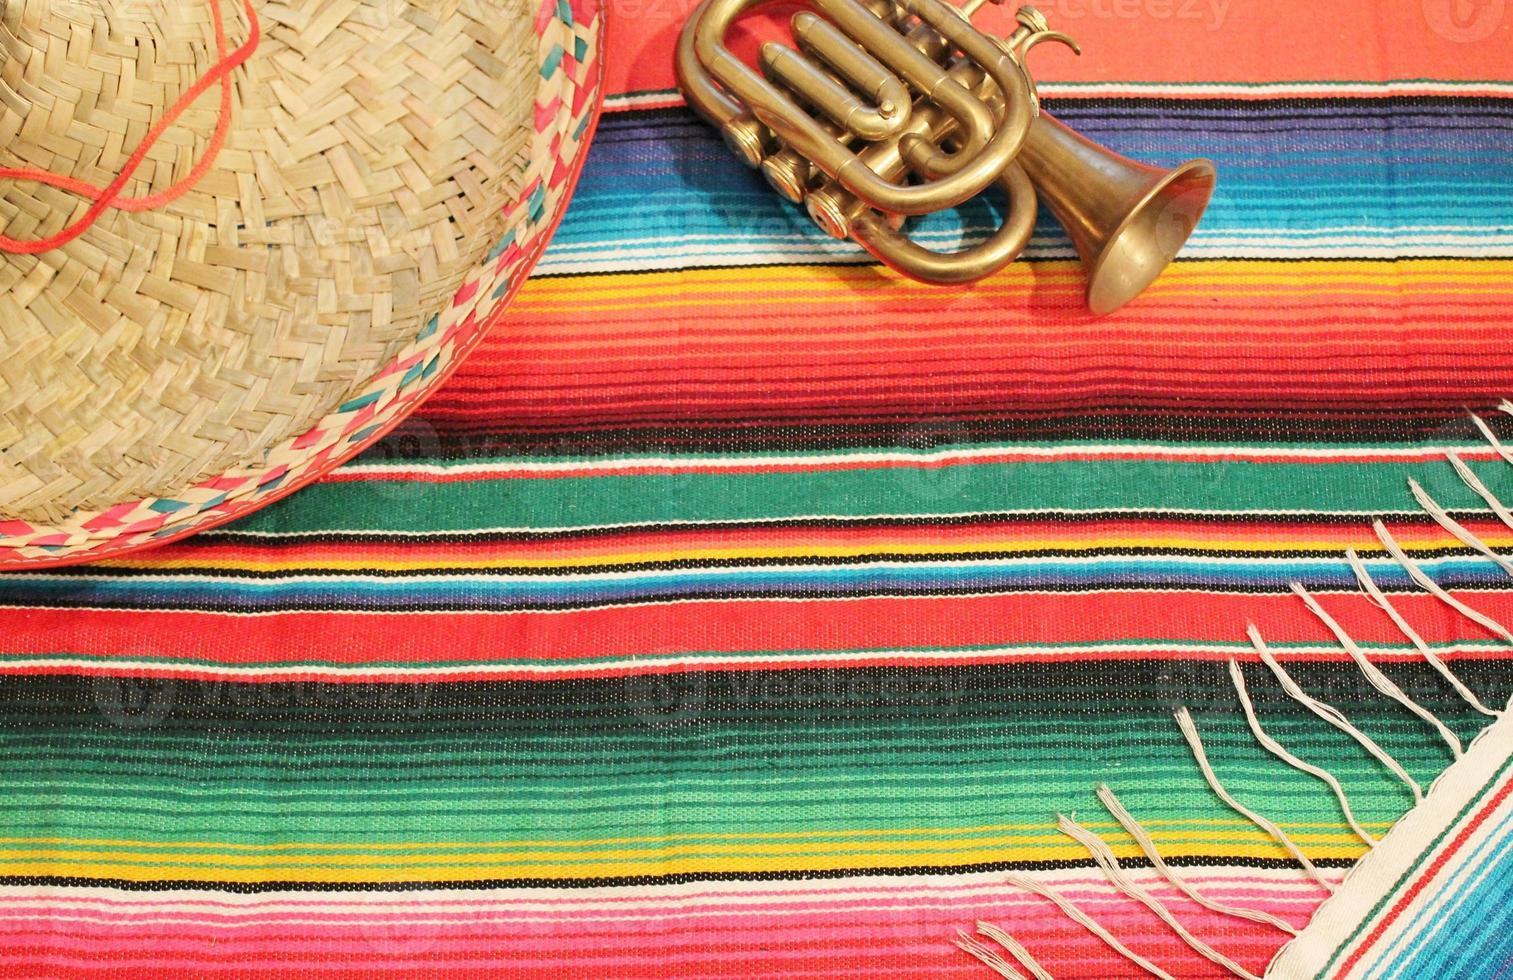 tapis poncho fiesta mexicaine fond sombrero copie espace photo